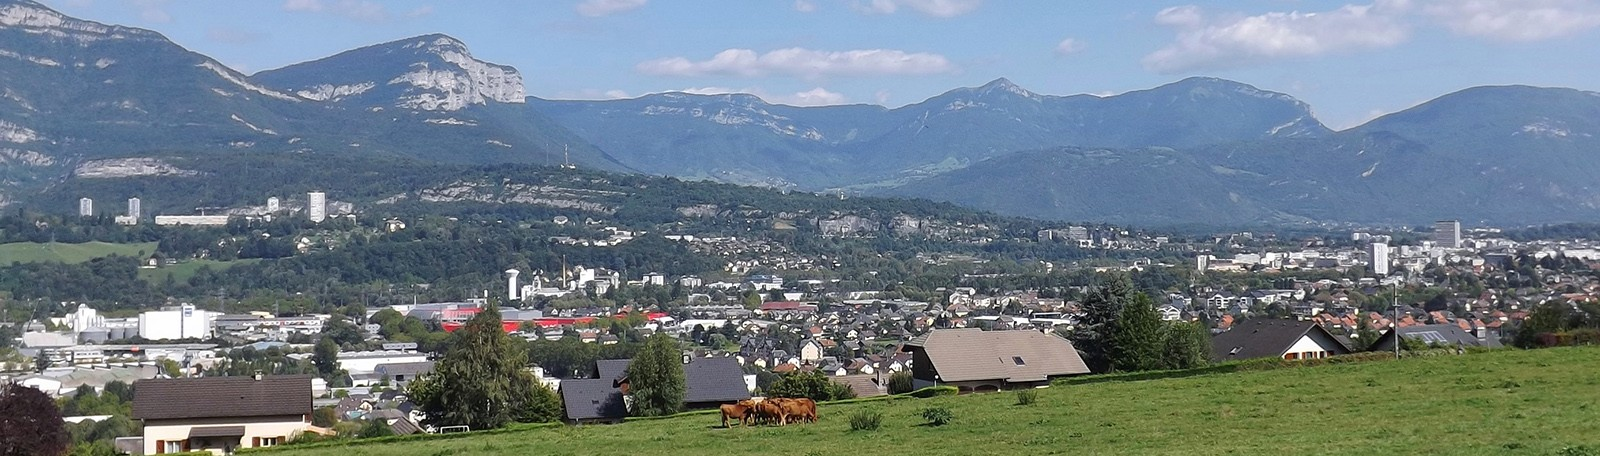 Stationner à Chambéry Cassine